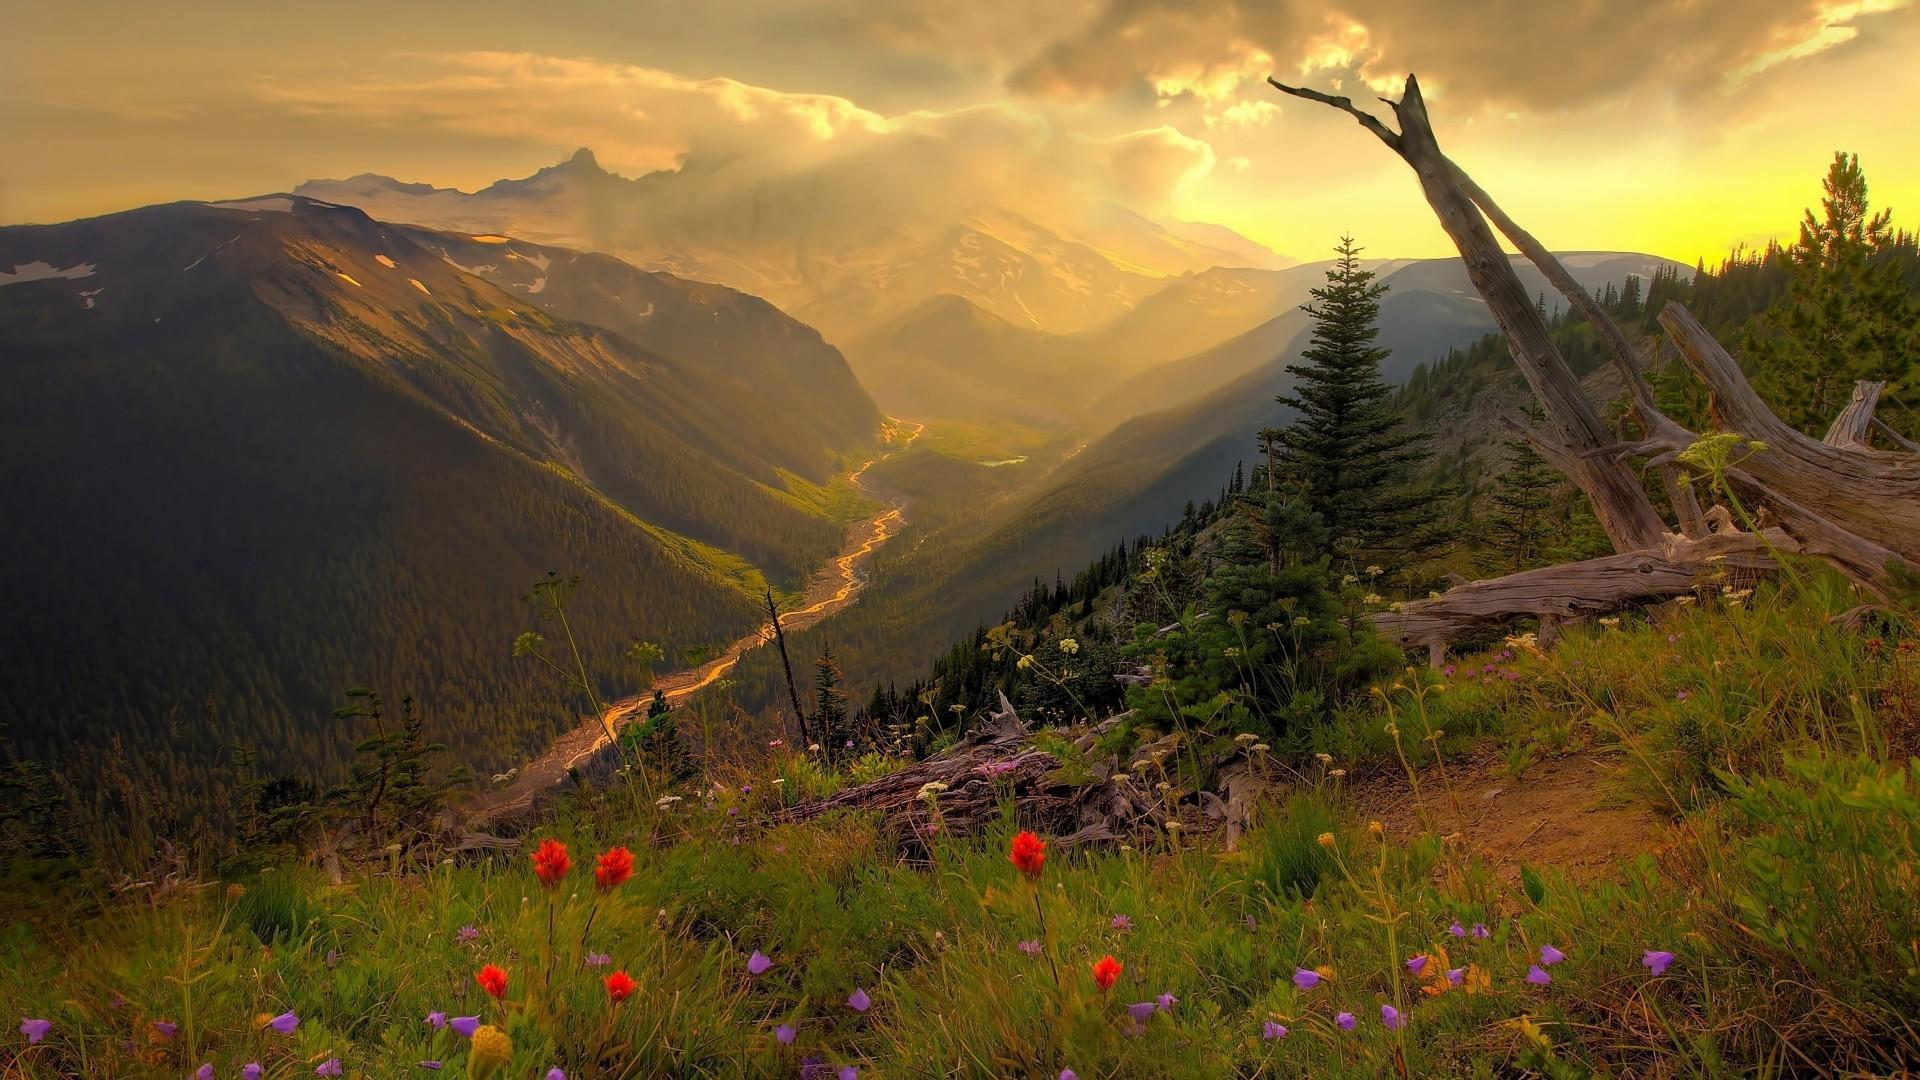 twilight time of day wallpaper 16221 PC en 1920x1080